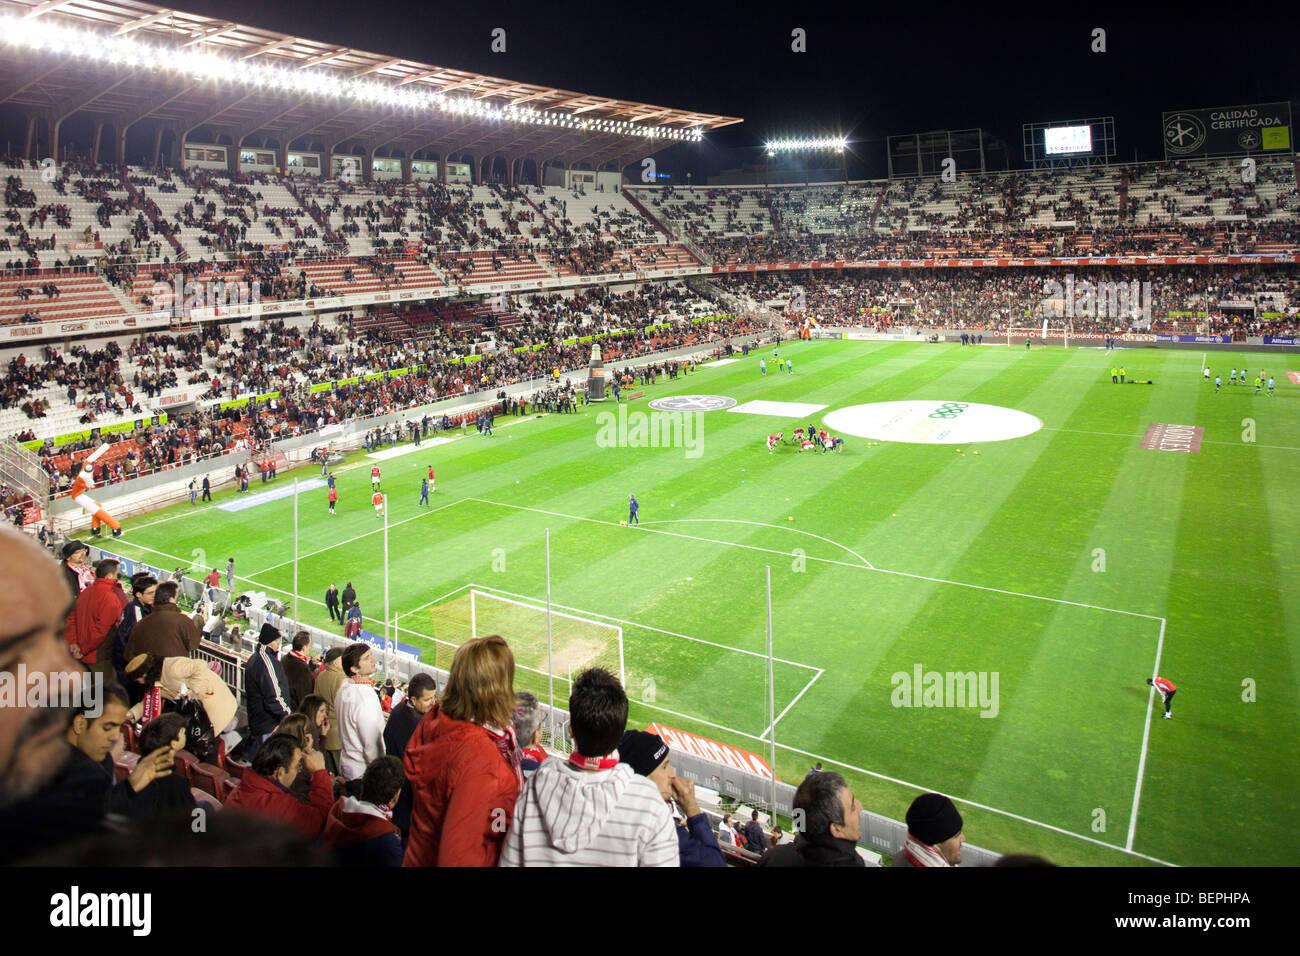 View Of Sanchez Pizjuan Stadium Belonging To Sevilla Fc Seville Spain Stock Photo Alamy